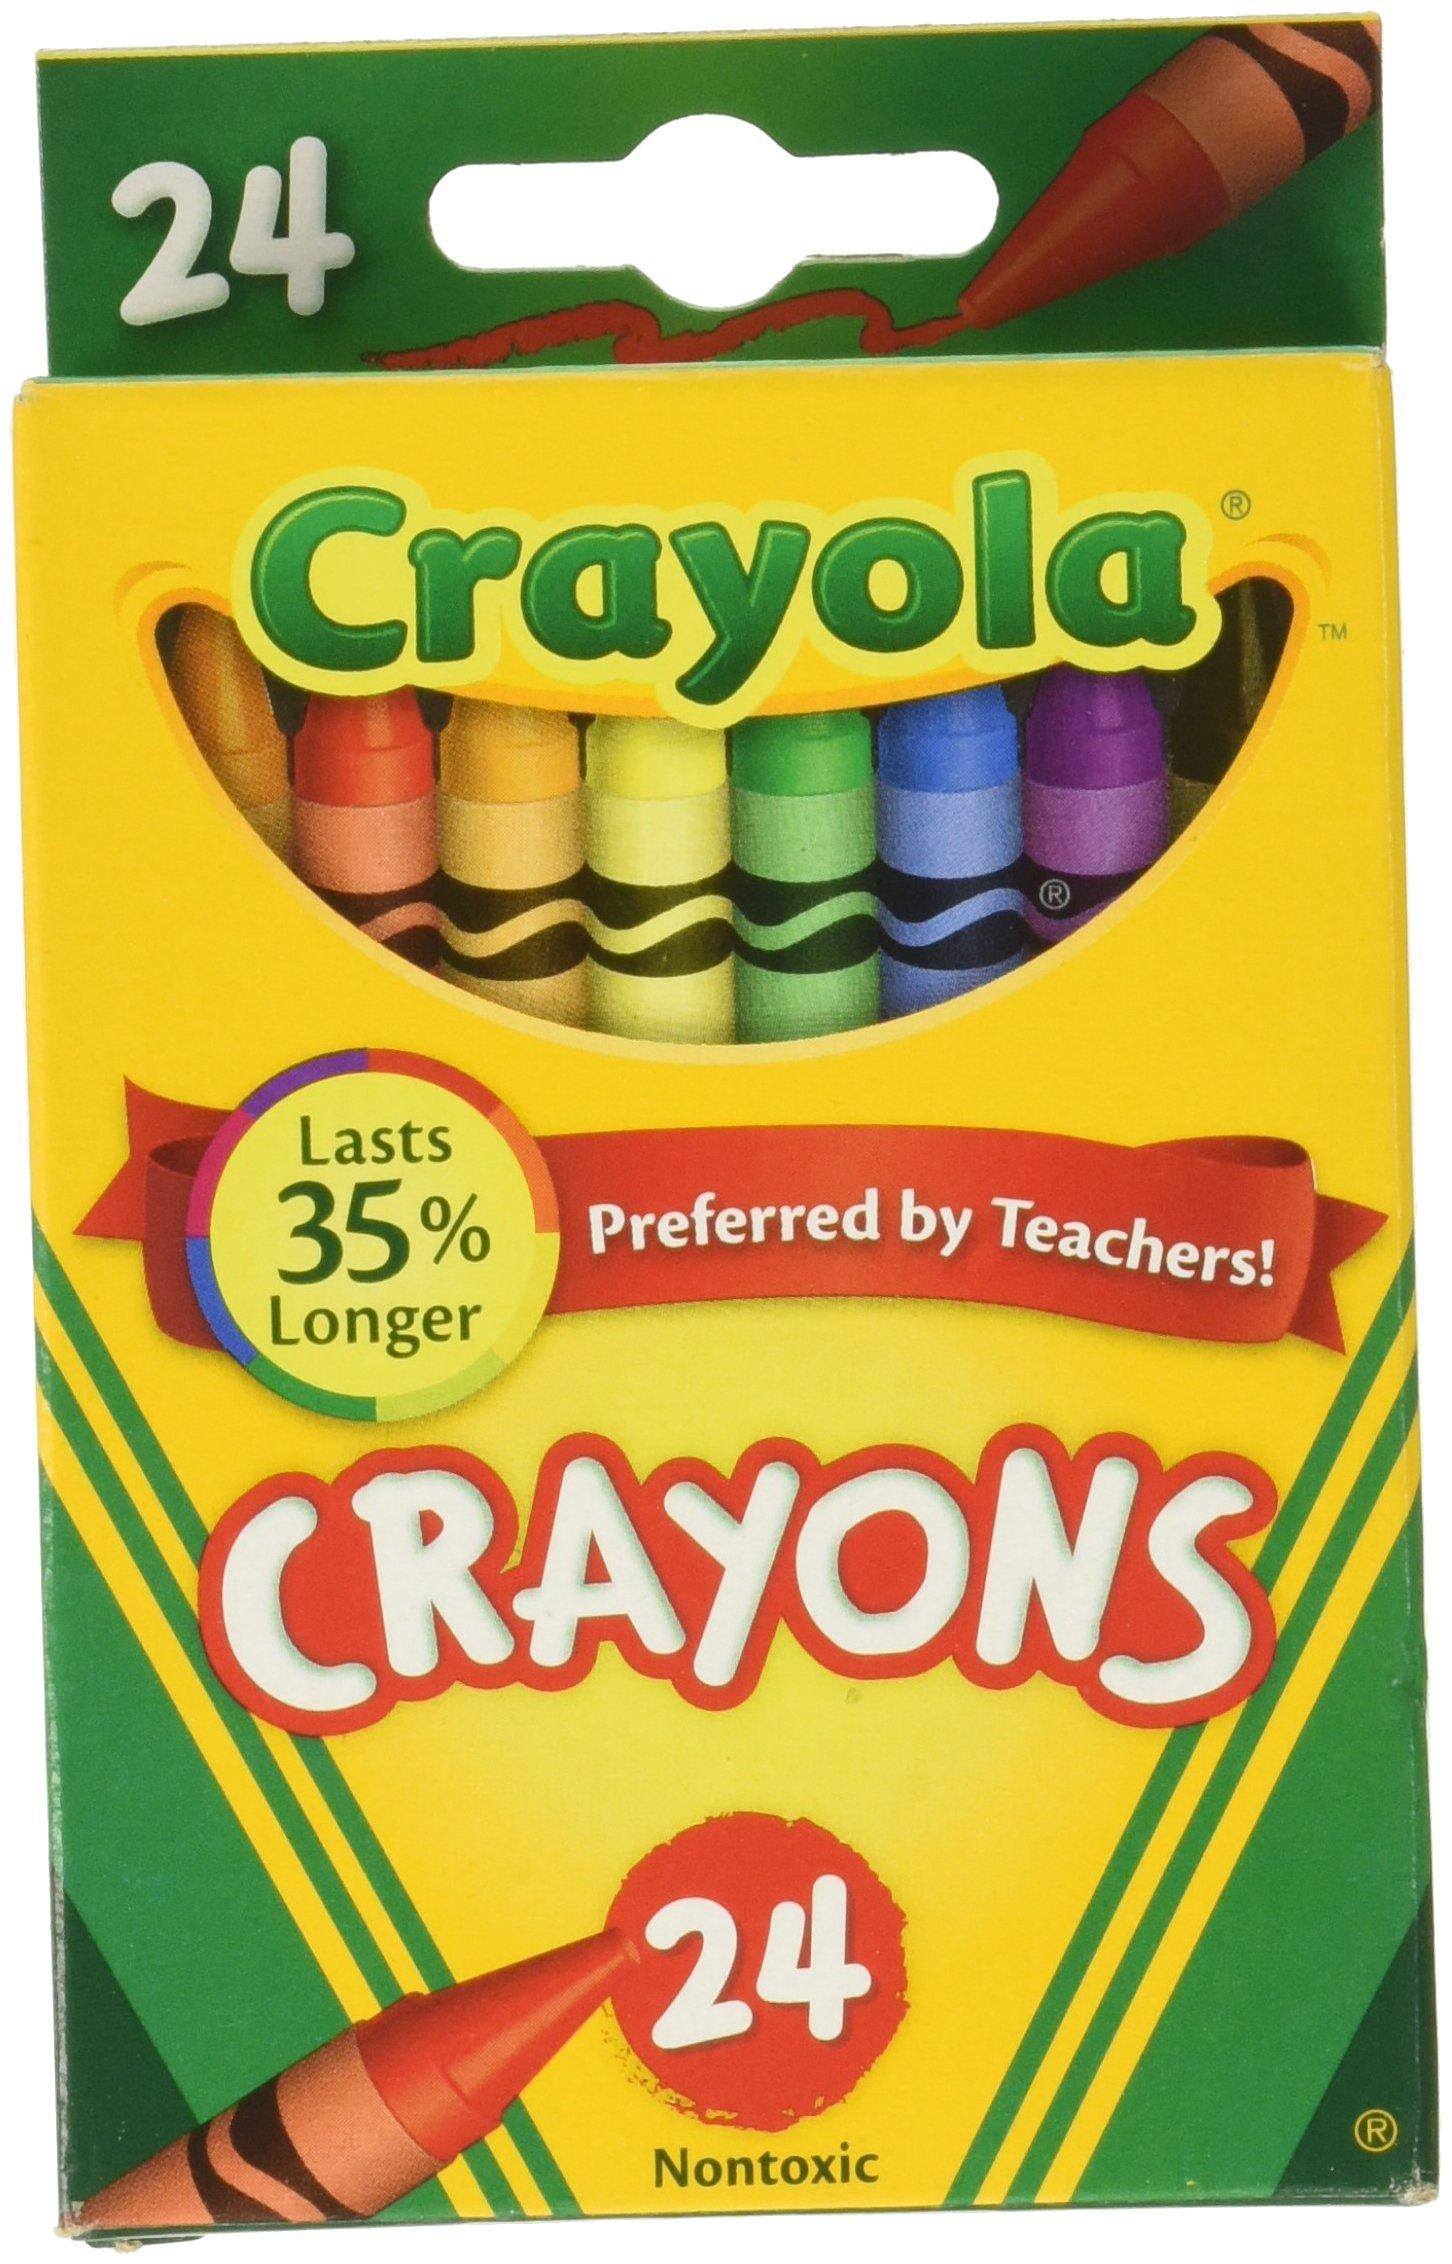 Crayola Crayons 24 Colors, (Pack of 6) by Crayola